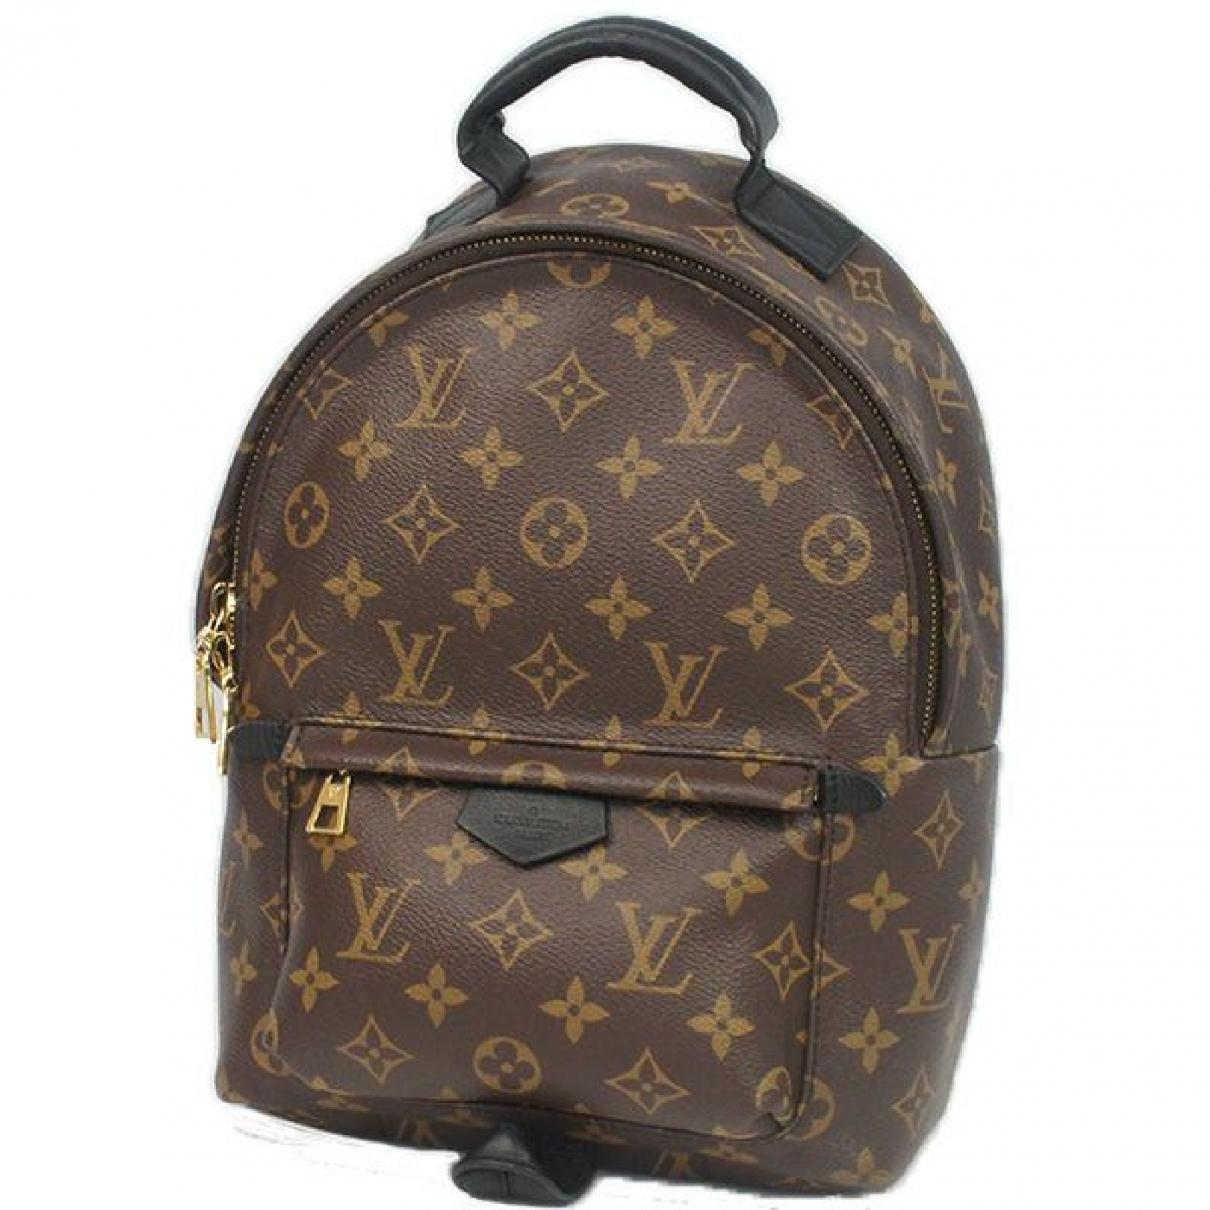 Louis Vuitton \N Cloth backpack for Women \N